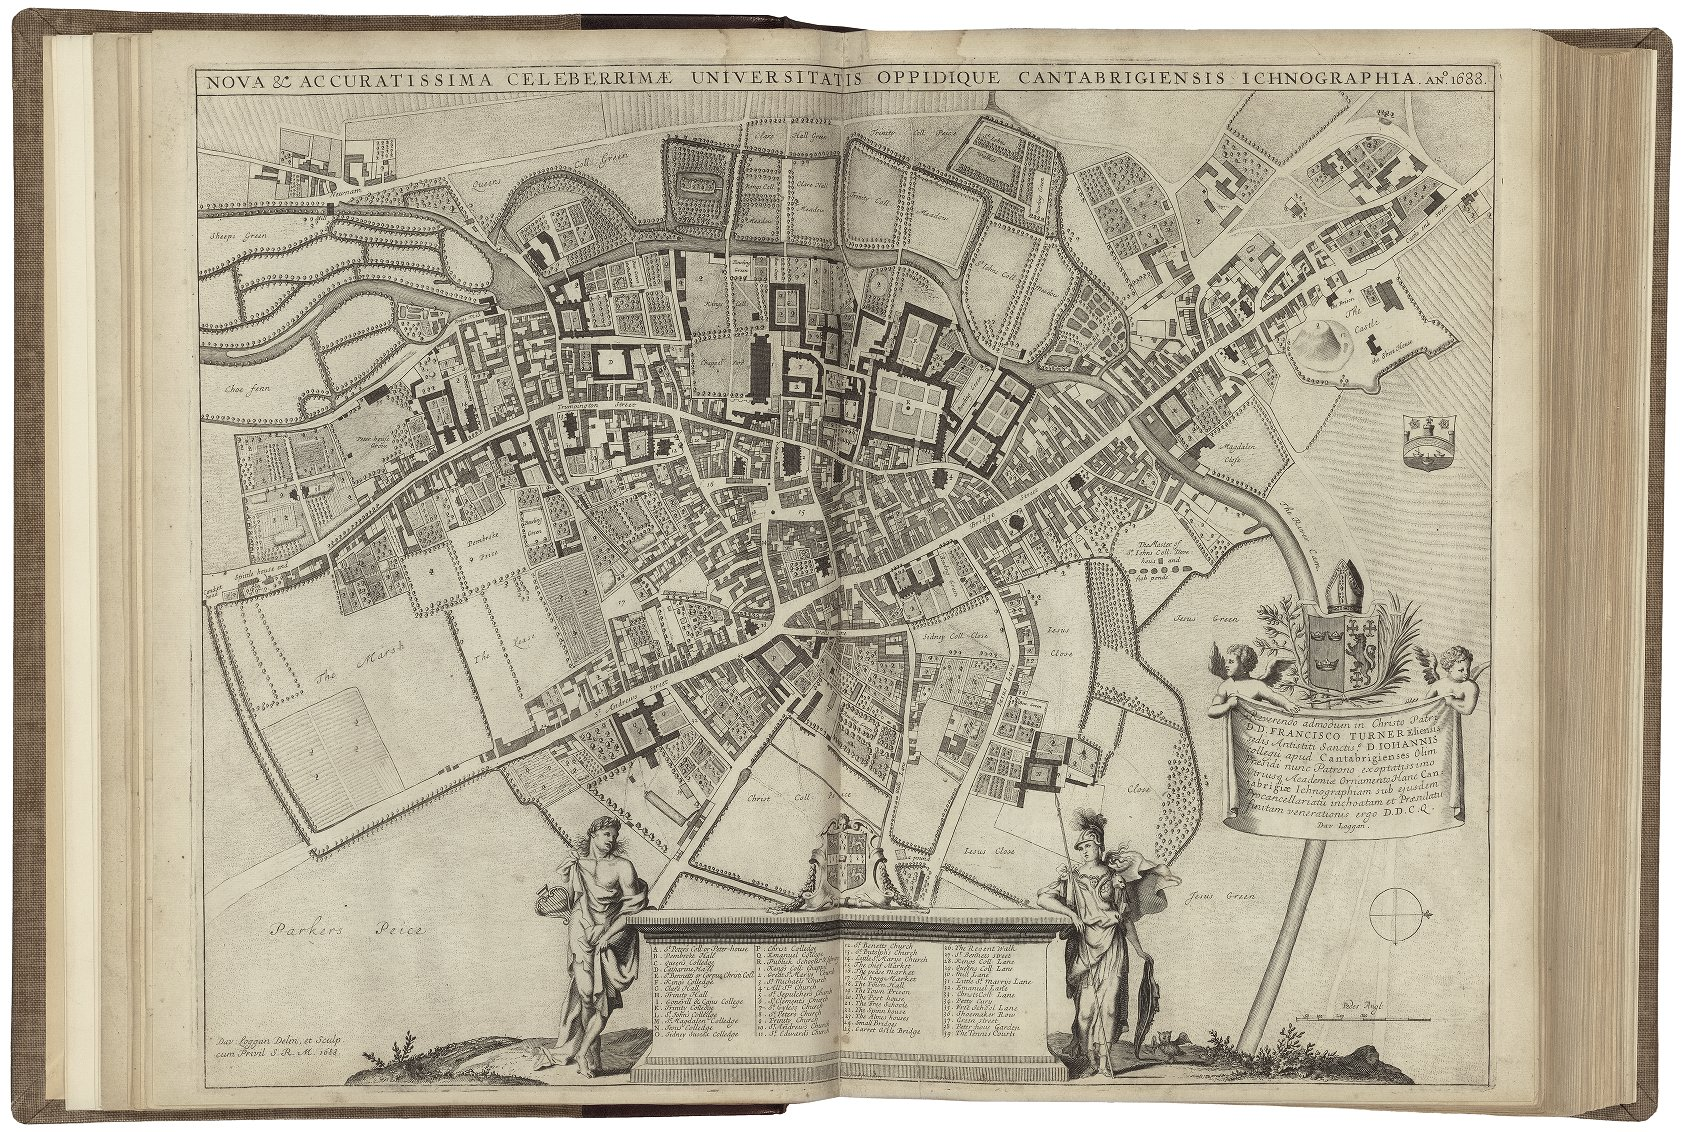 Aerial view circa fourteenth century of Cambridge University